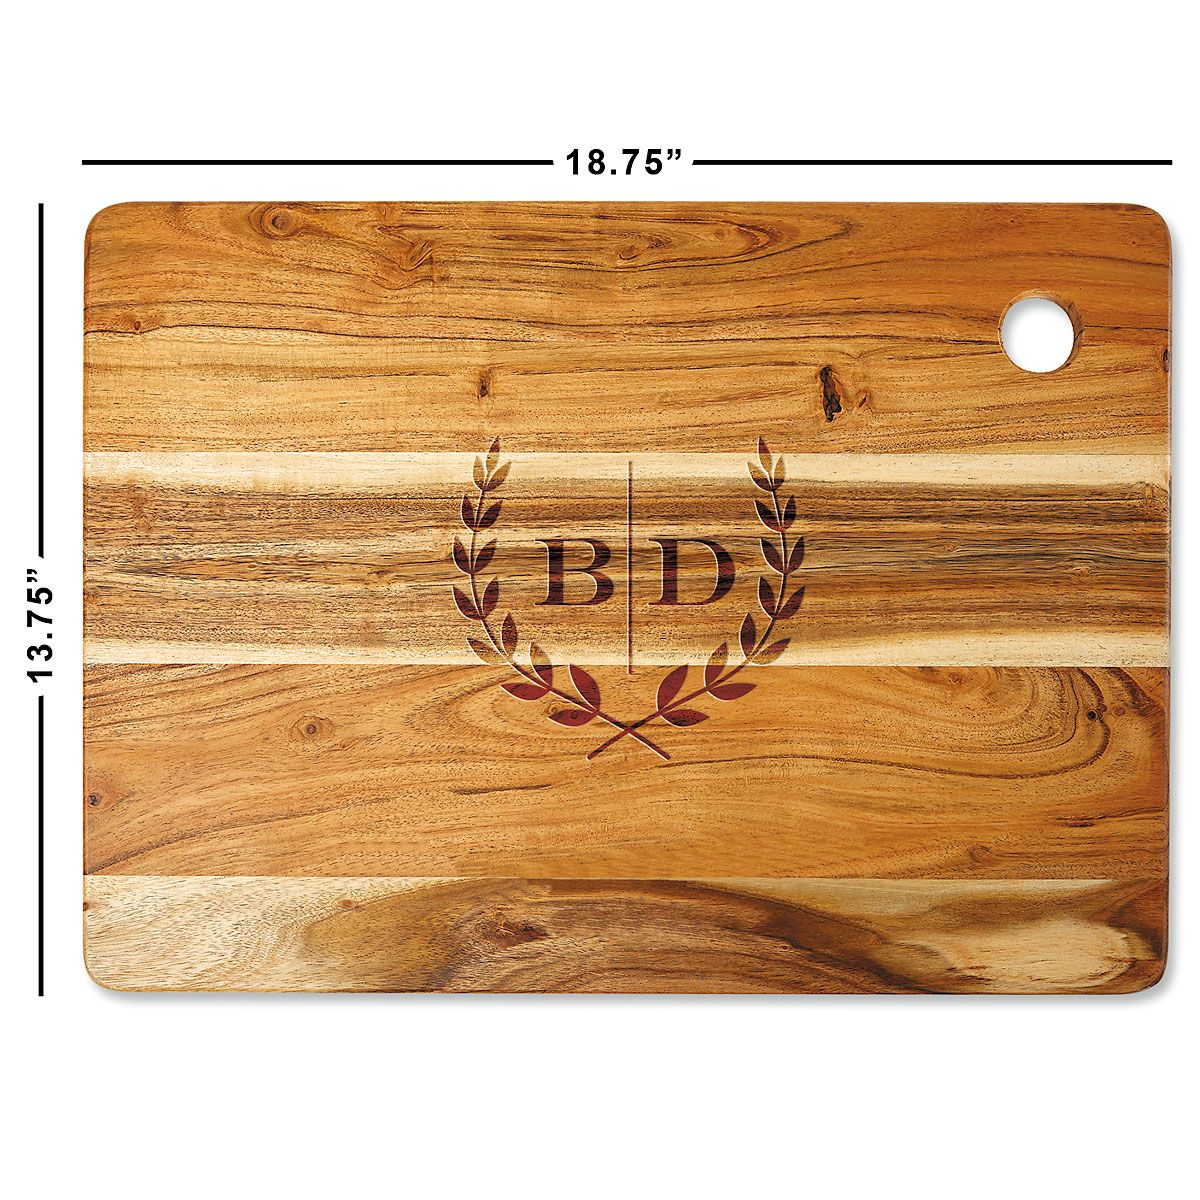 Acacia Laural Initials Engraved Cutting Board